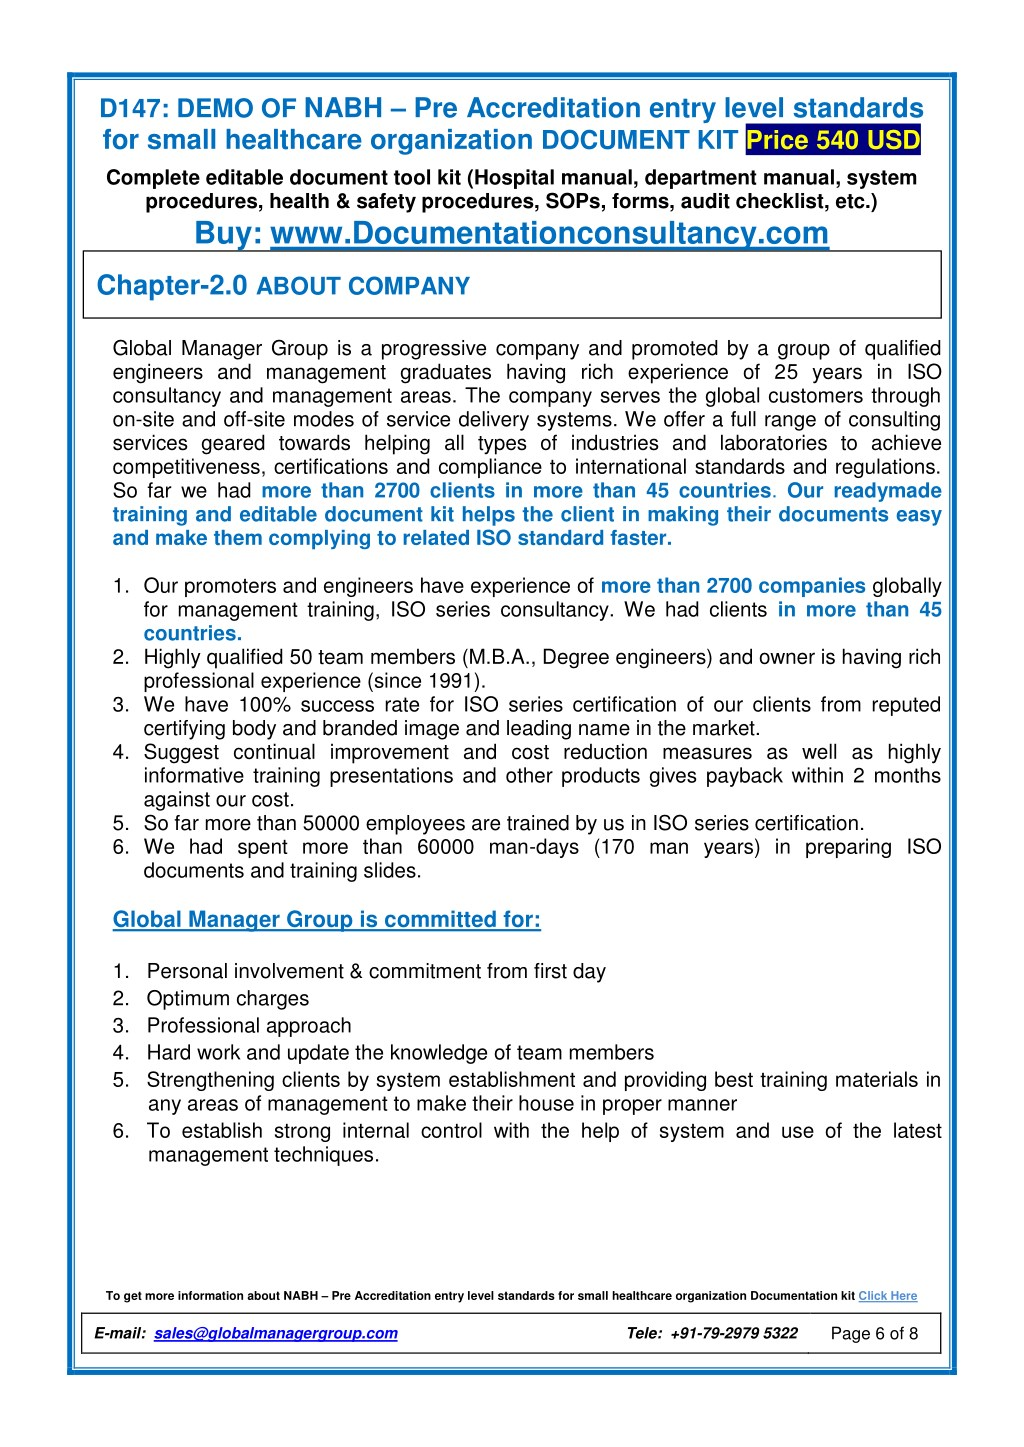 PPT - Small Healthcare Accreditation Documentation Kit